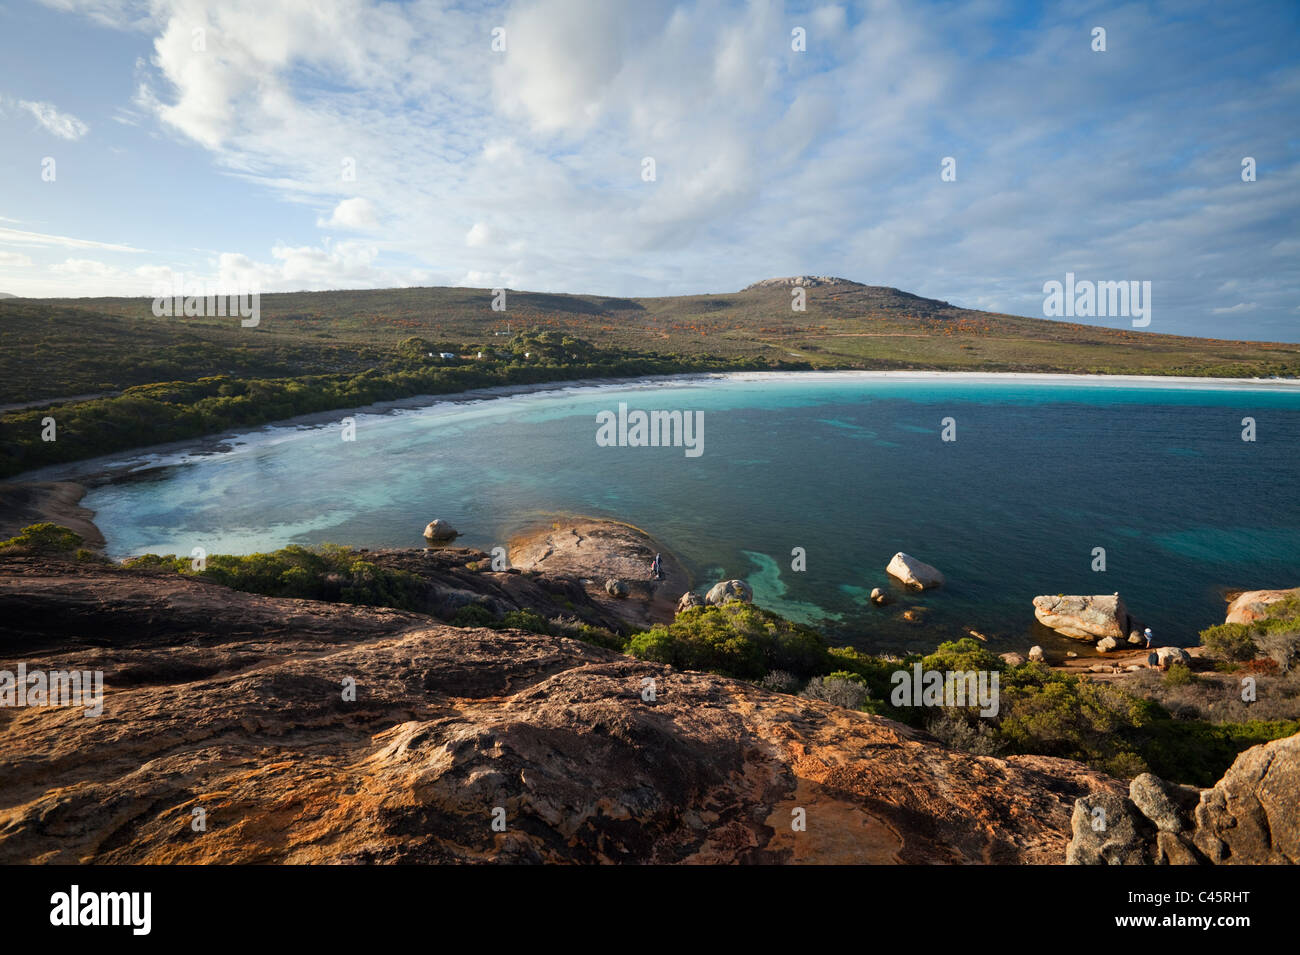 View across Lucky Bay. Cape Le Grand National Park, Esperance, Western Australia, Australia Stock Photo